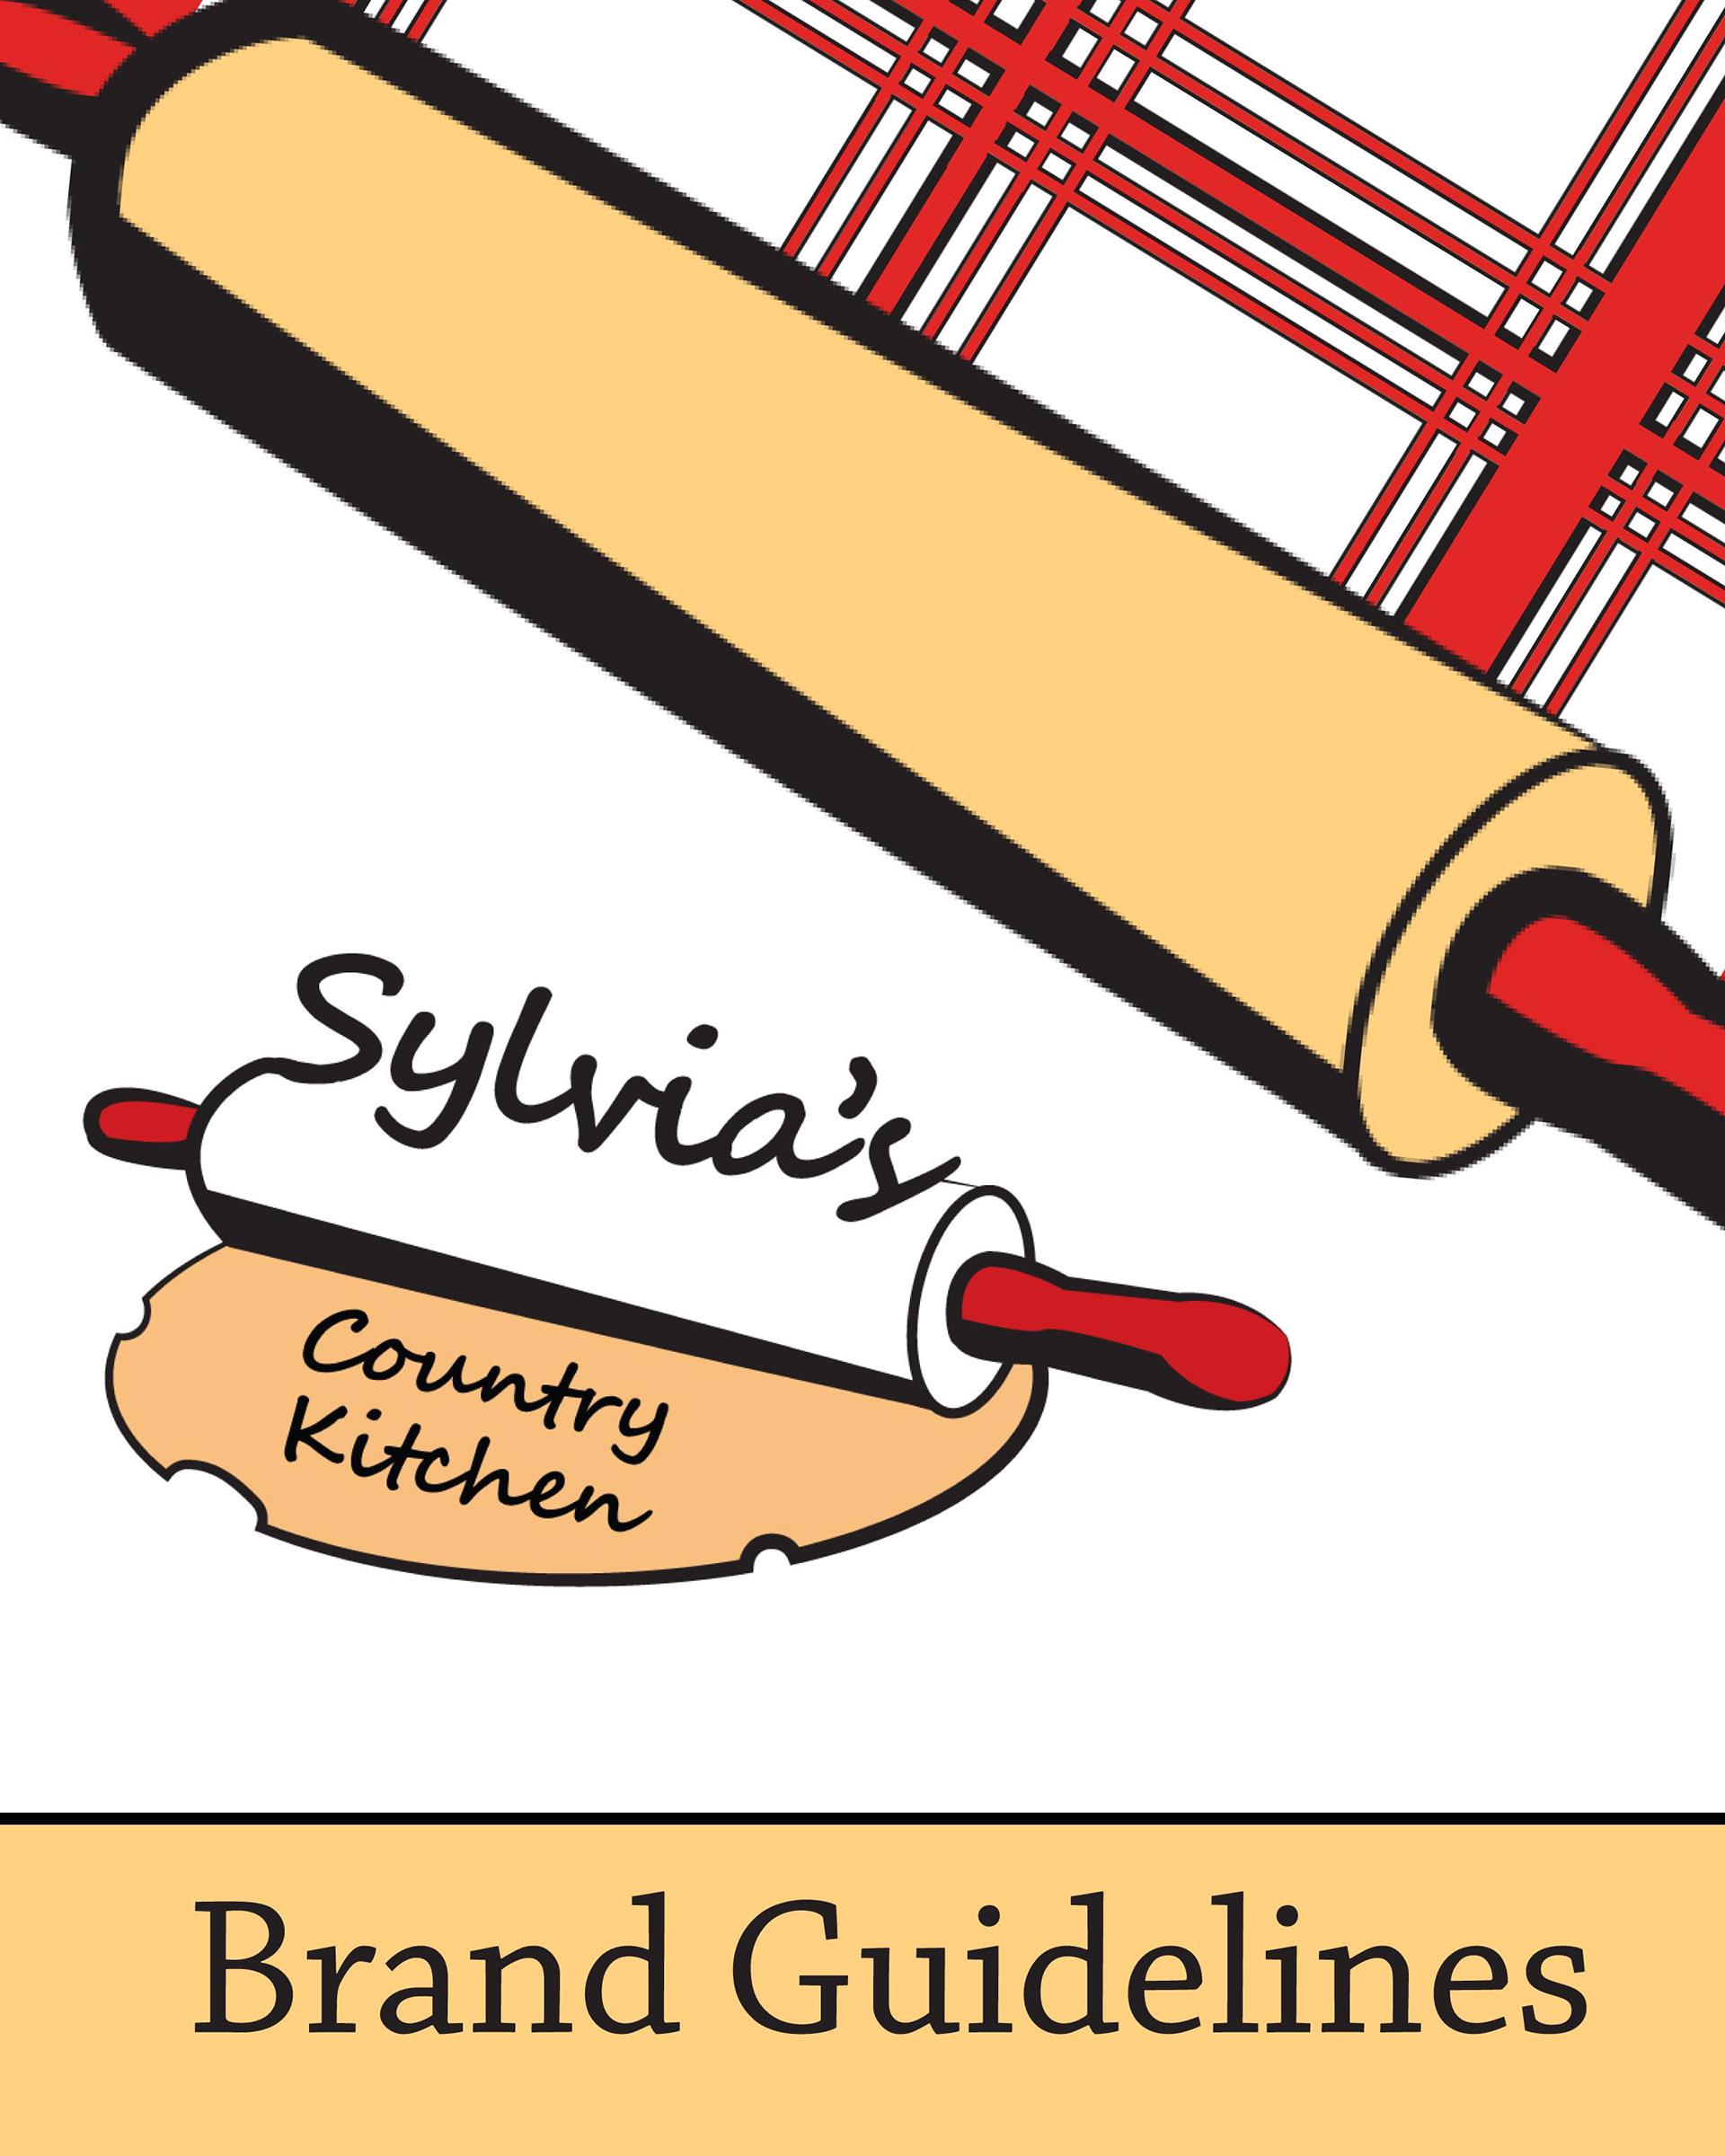 Country Kitchen Logo danielle burton